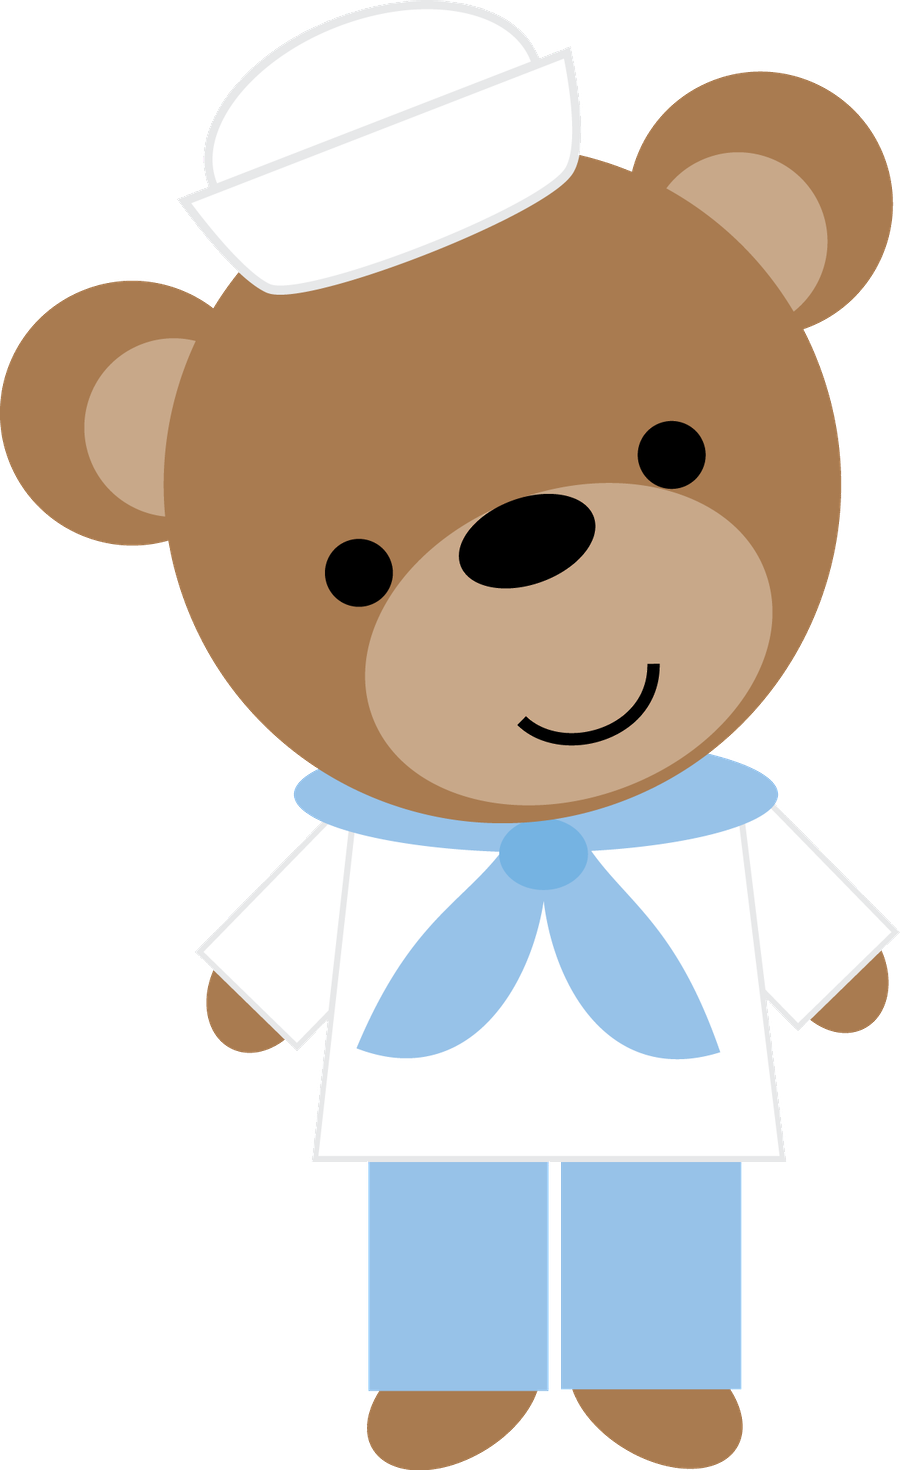 Marinheiro minus pinterest teddy. Hugging clipart printable